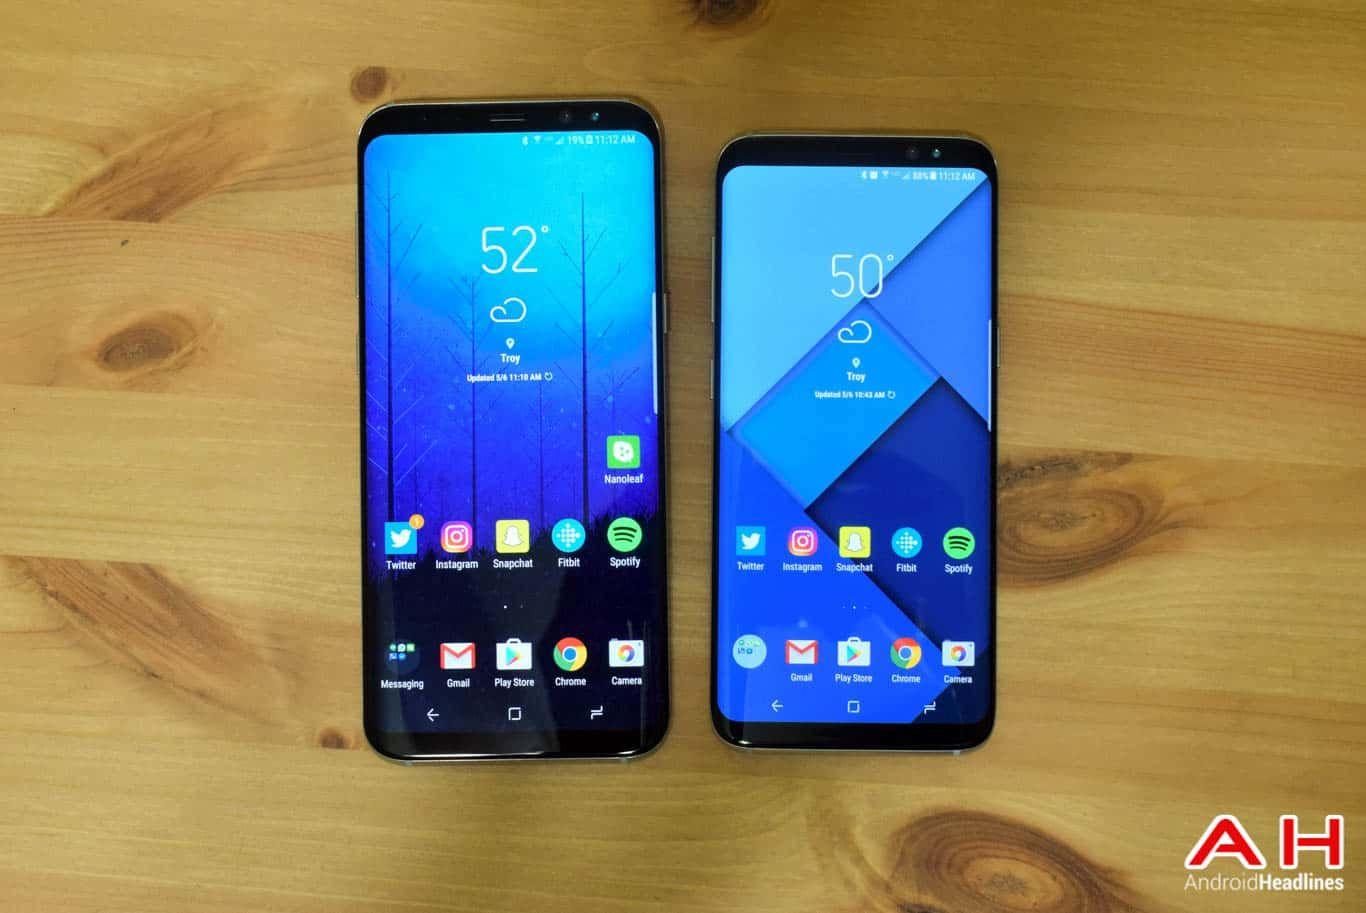 Exynos Galaxy S8, Galaxy S8 Plus Get DualBootPatcher Support